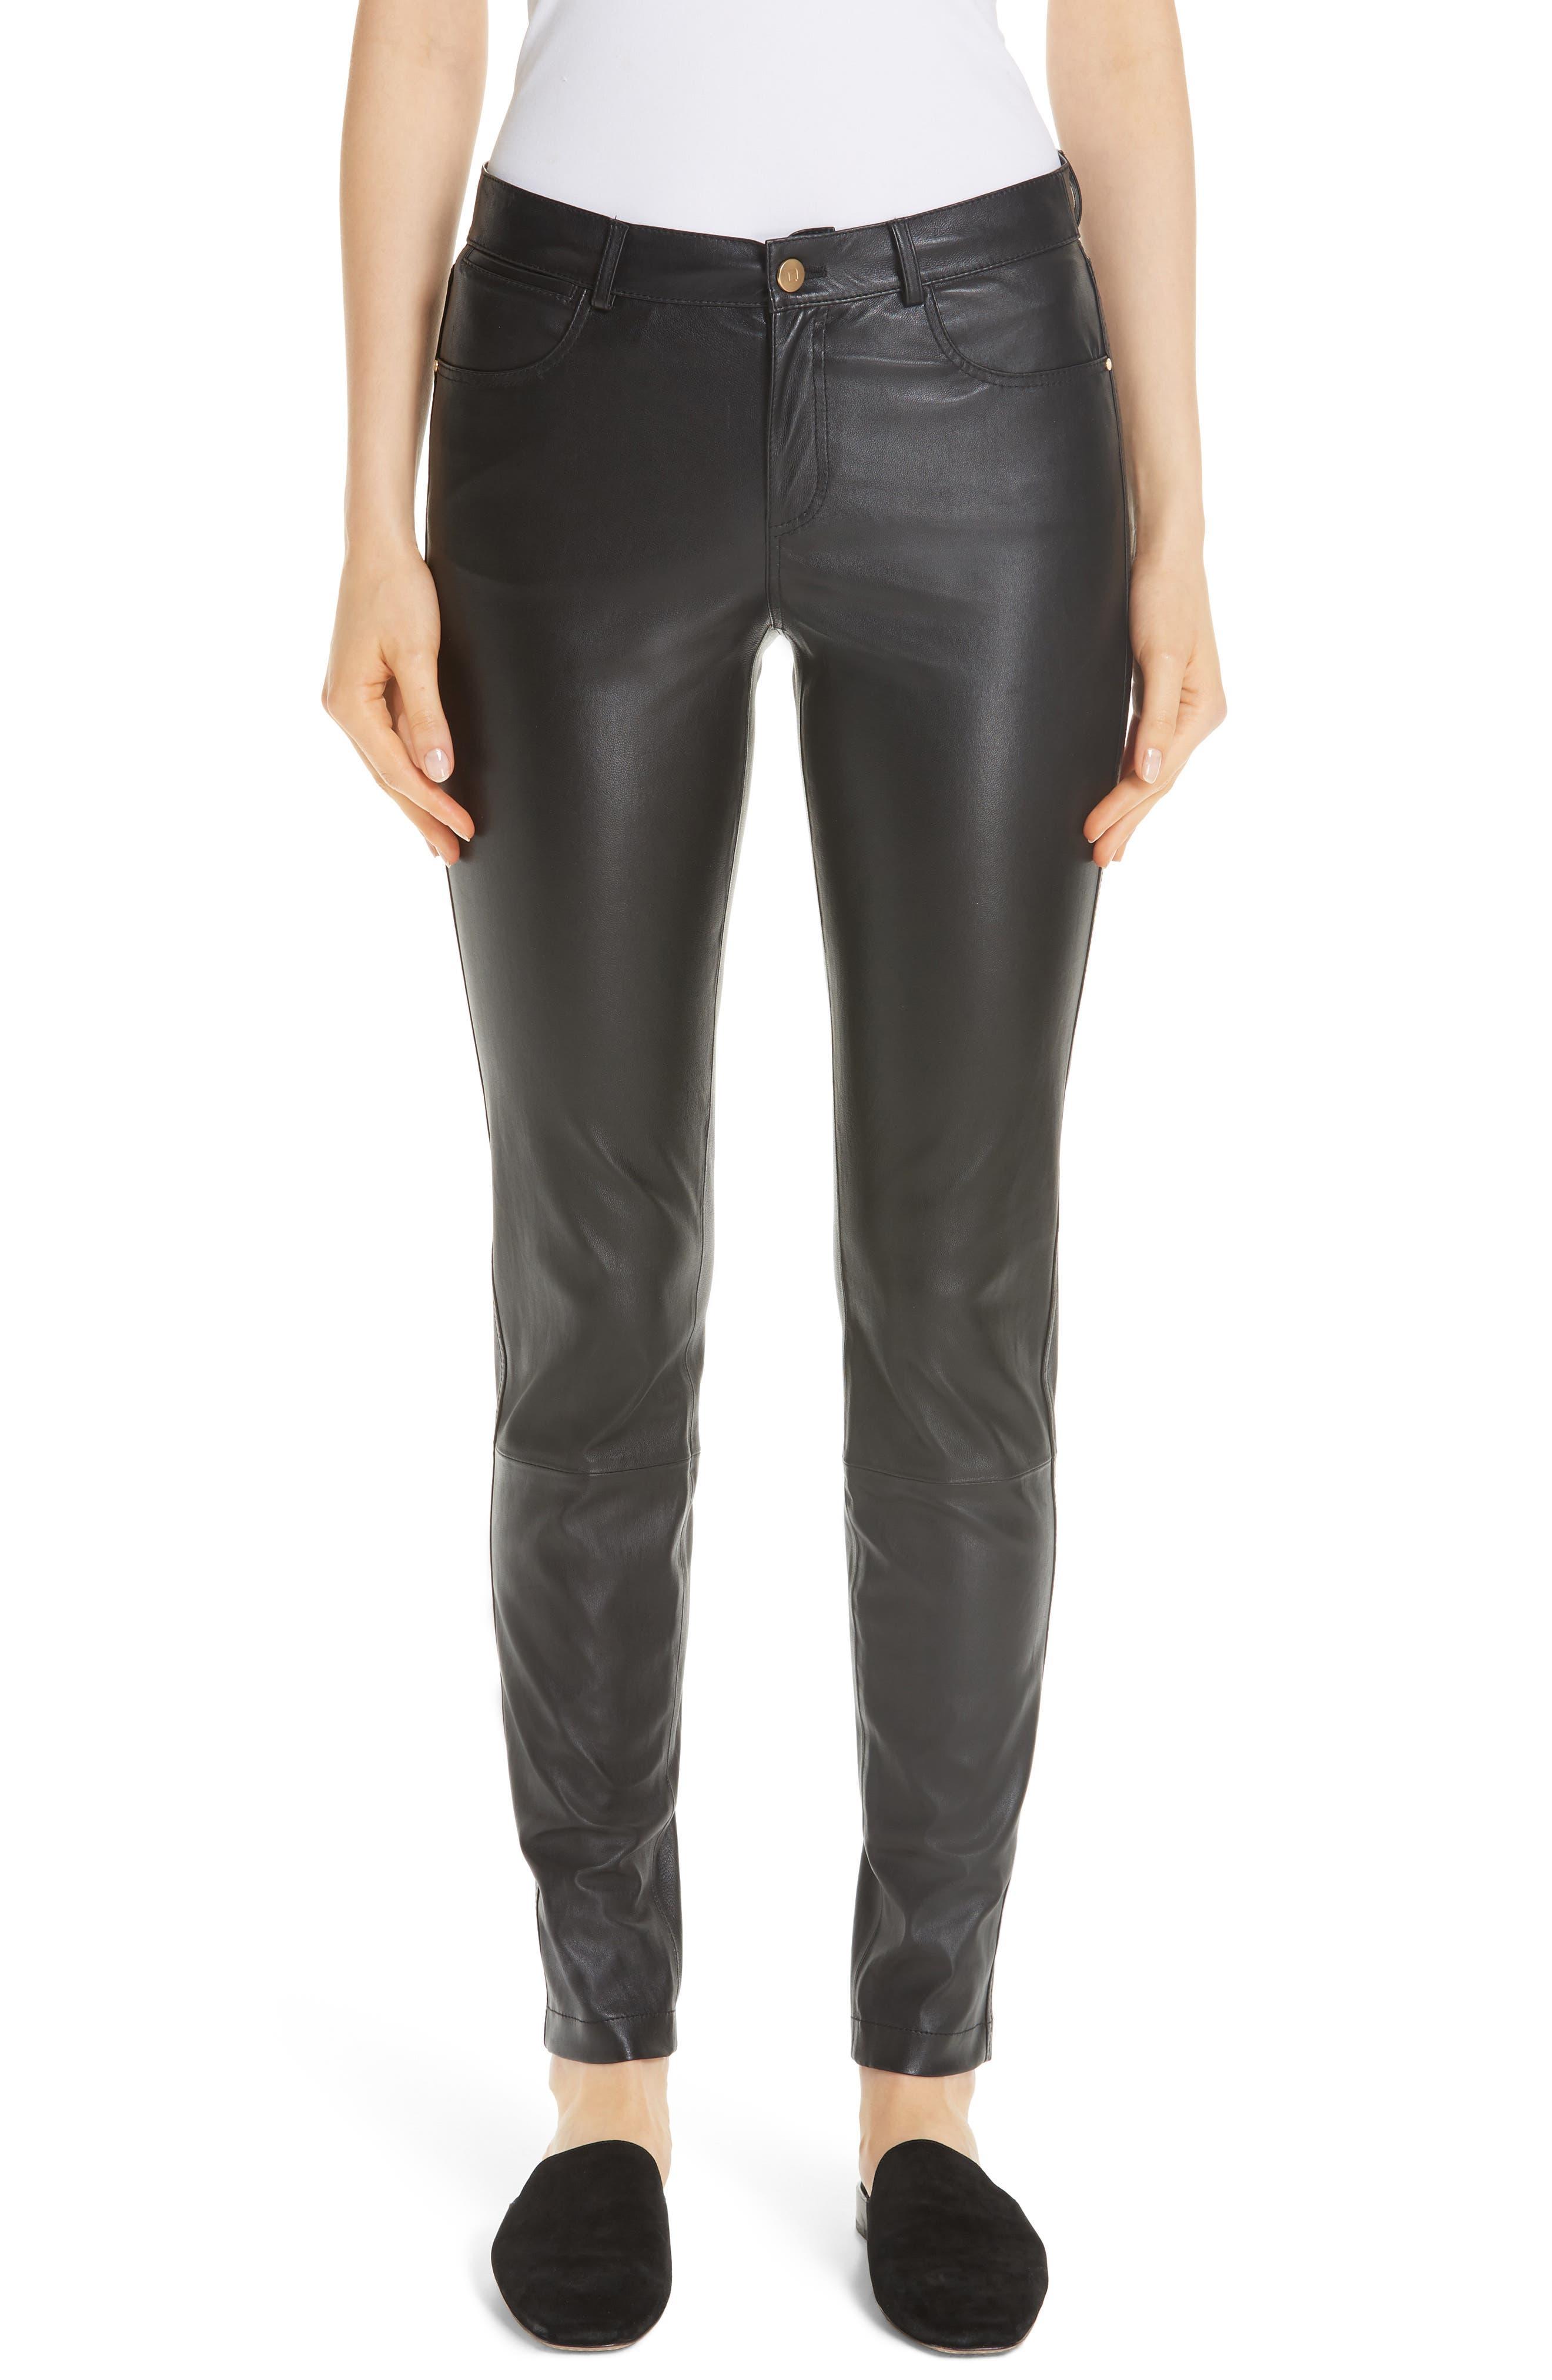 Mercer Nappa Leather Pants,                             Main thumbnail 1, color,                             BLACK